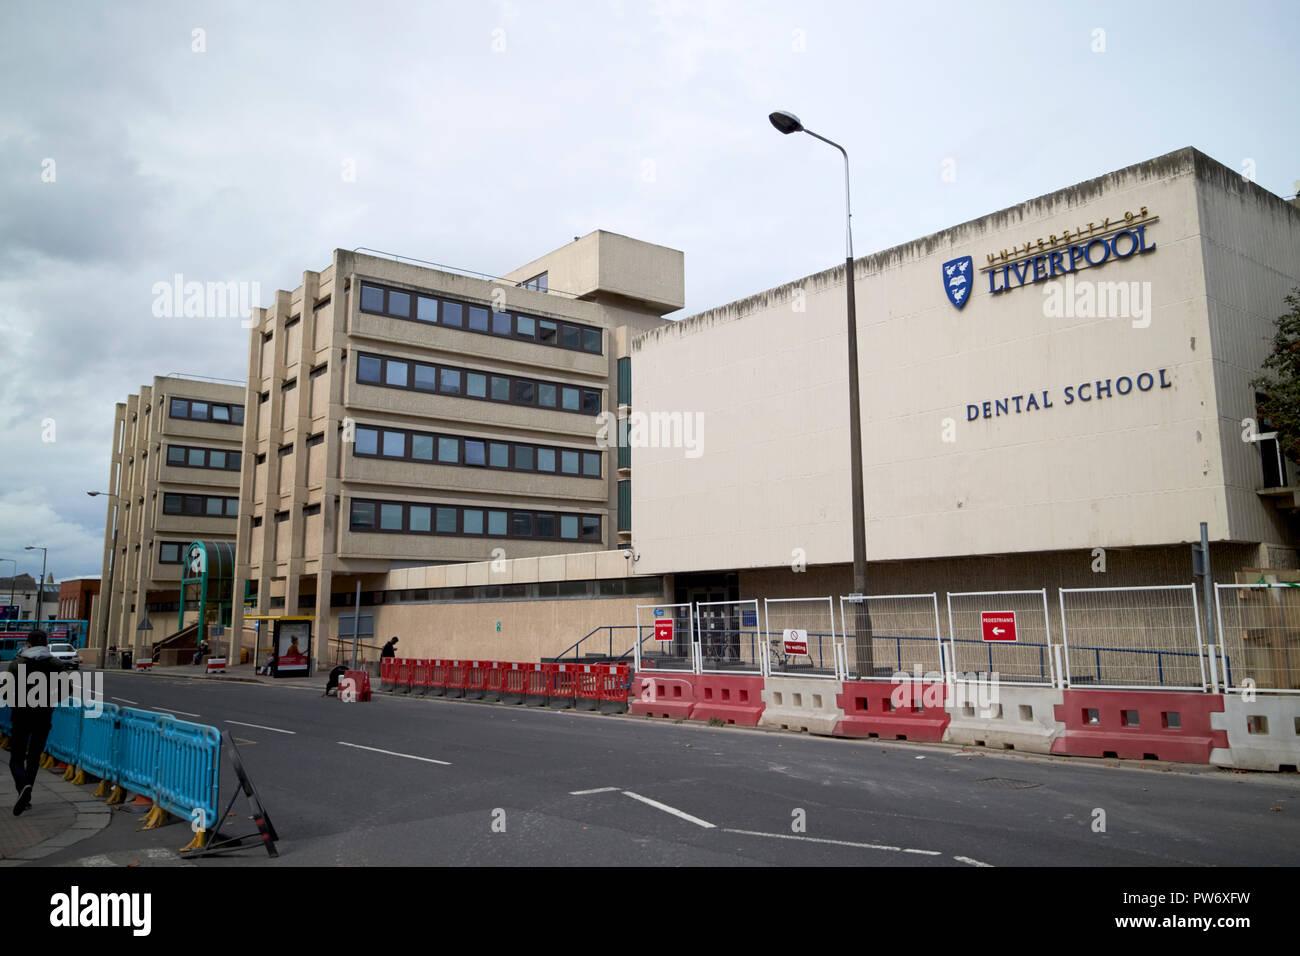 University of Liverpool dental school and liverpool university dental hospital Merseyside England UK - Stock Image